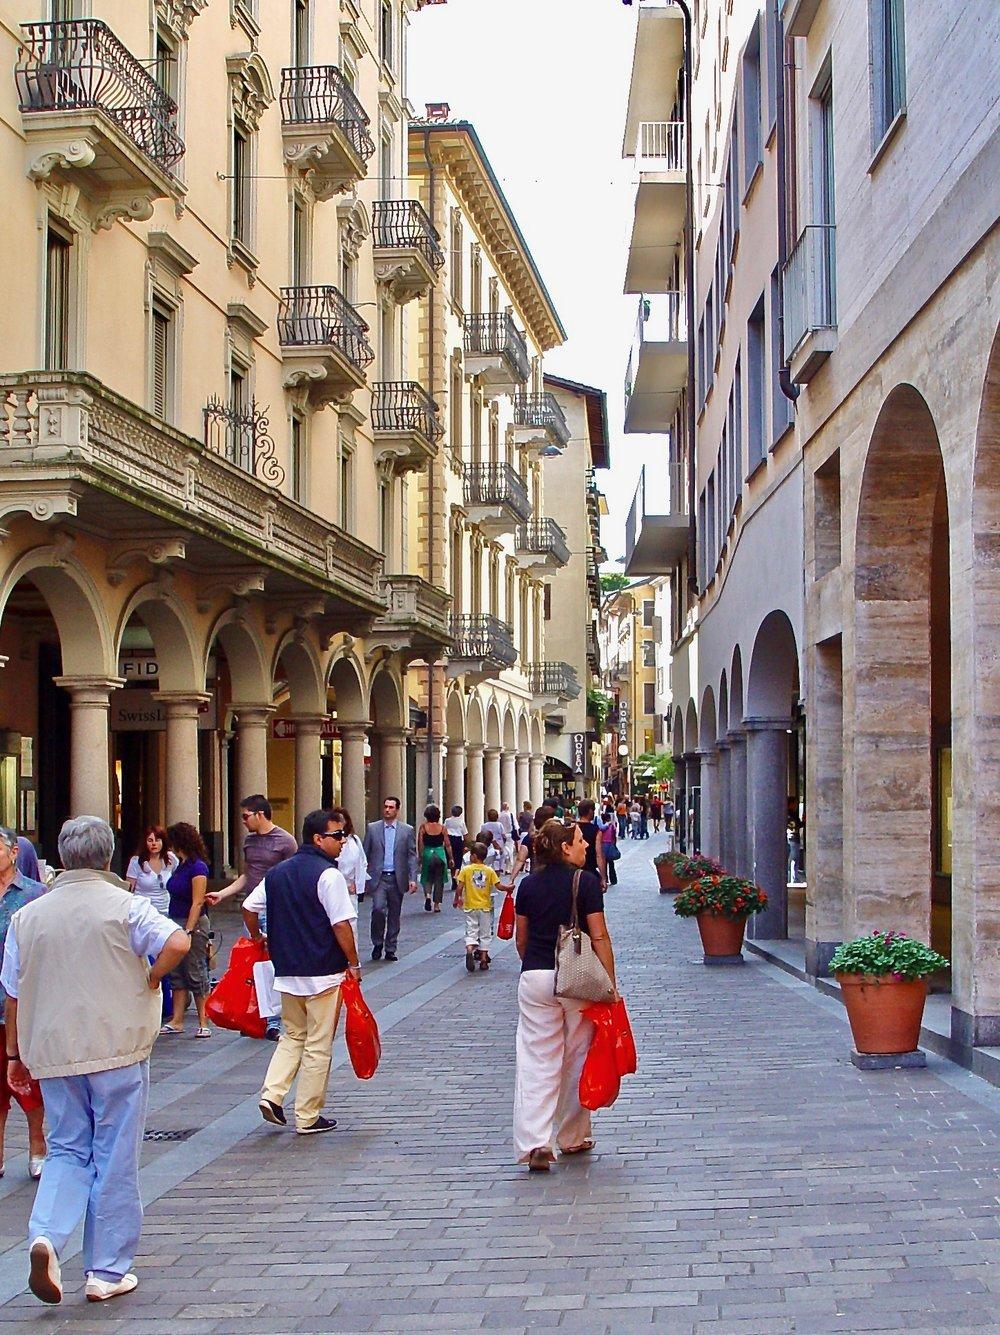 Via Nassa a Lugano -Image by  Lugano Turismo